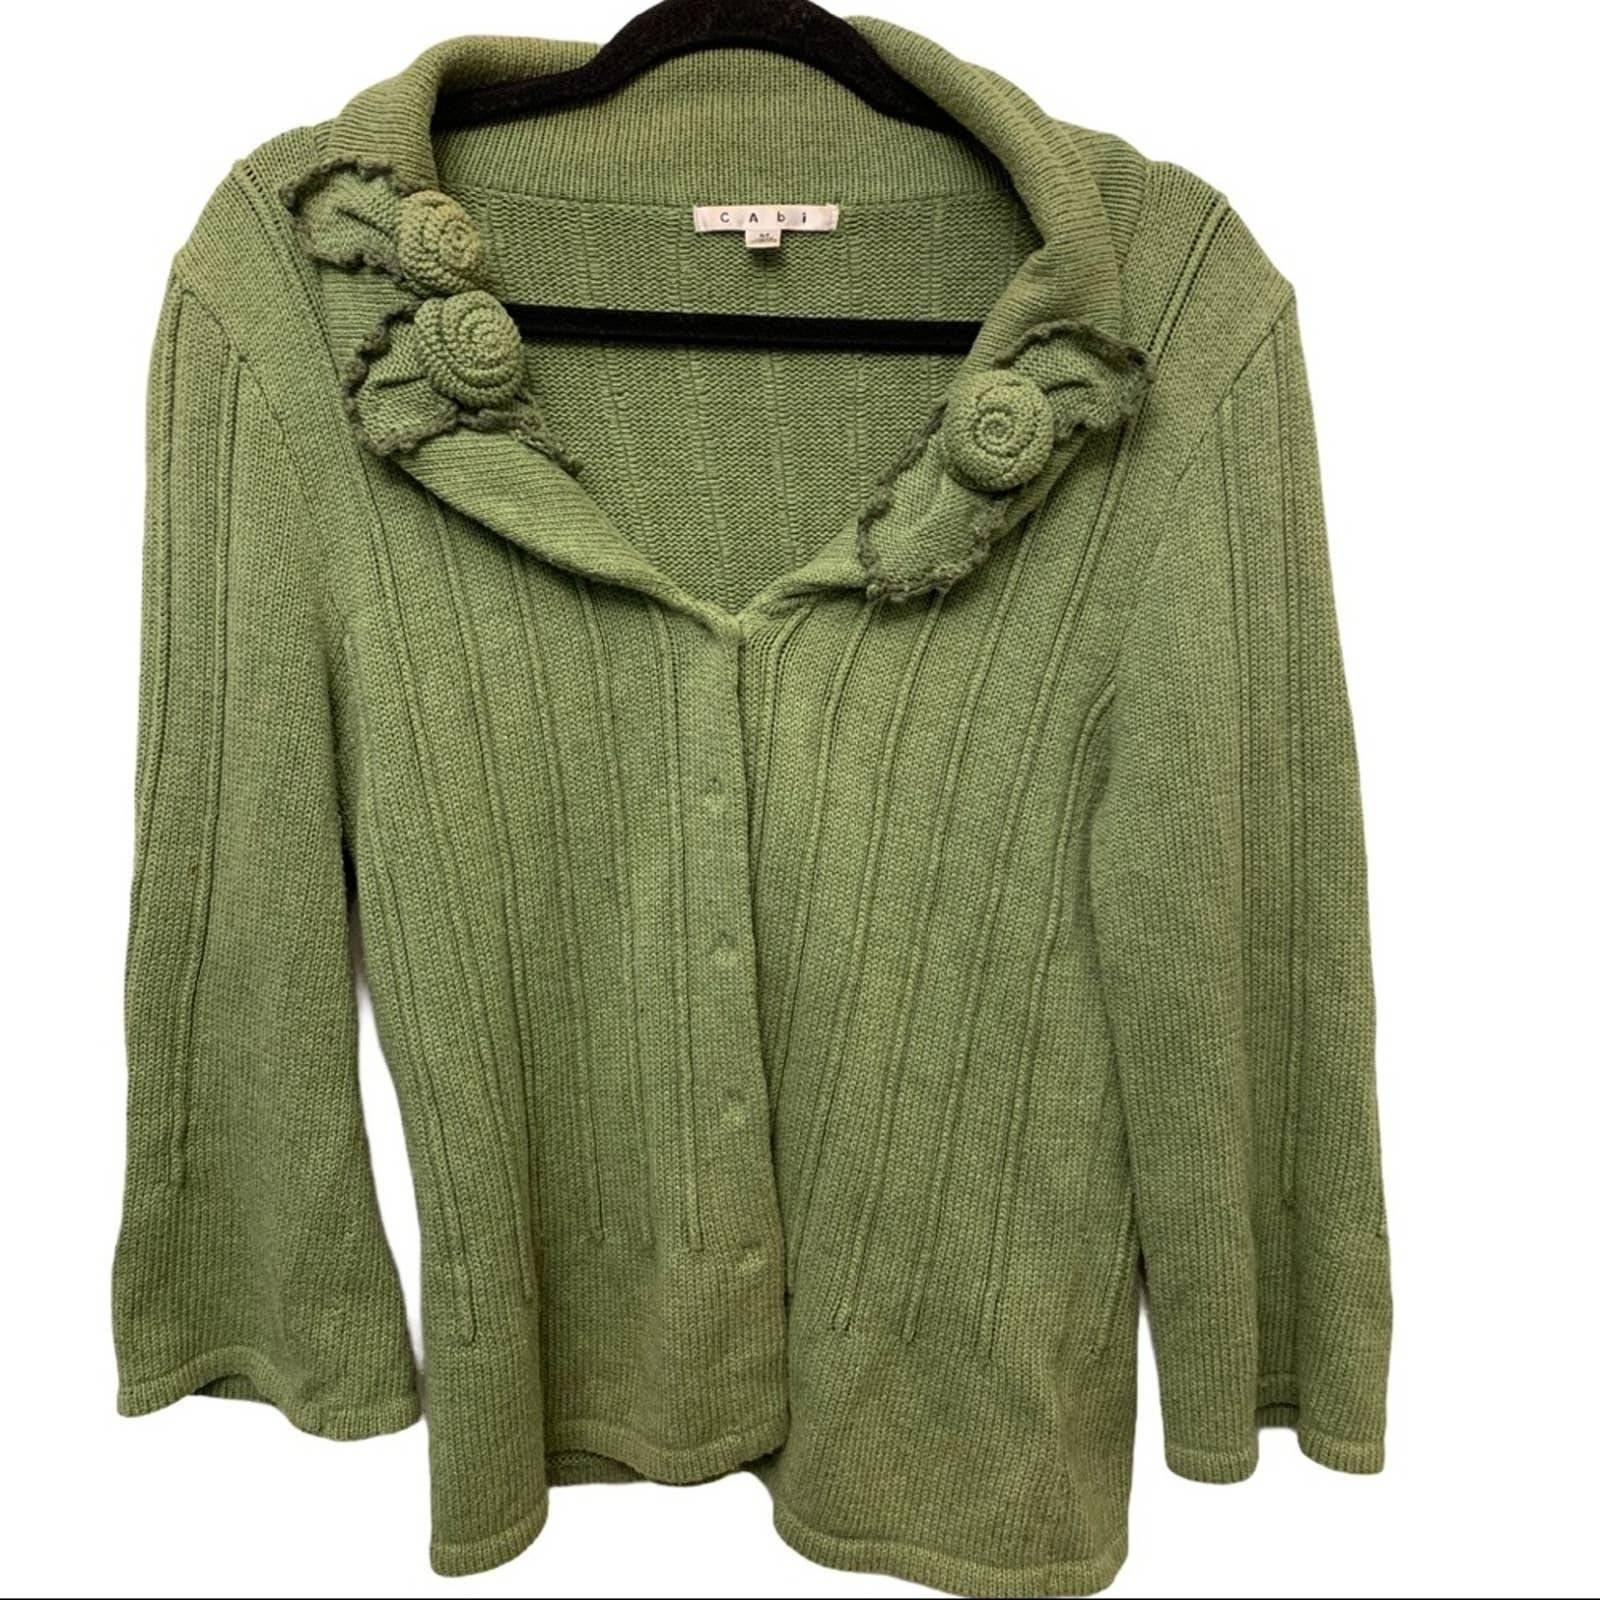 CAbi 100% Cotton Roses Sweater